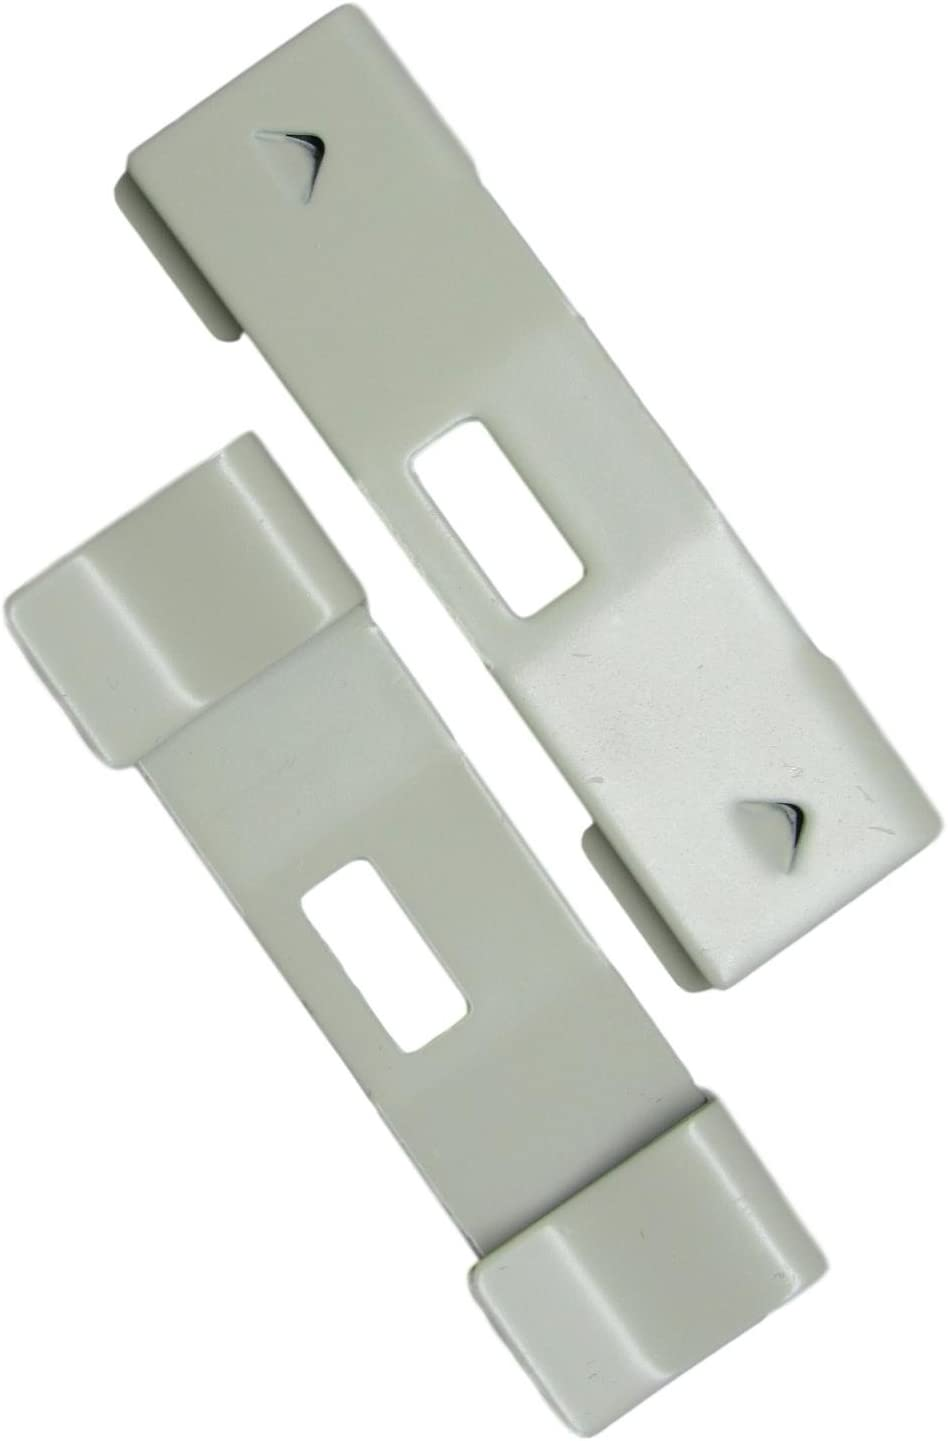 20 Pack Vertical Blind Vane Saver ~ Curved Ivory unisex Ranking TOP20 Repair Clips